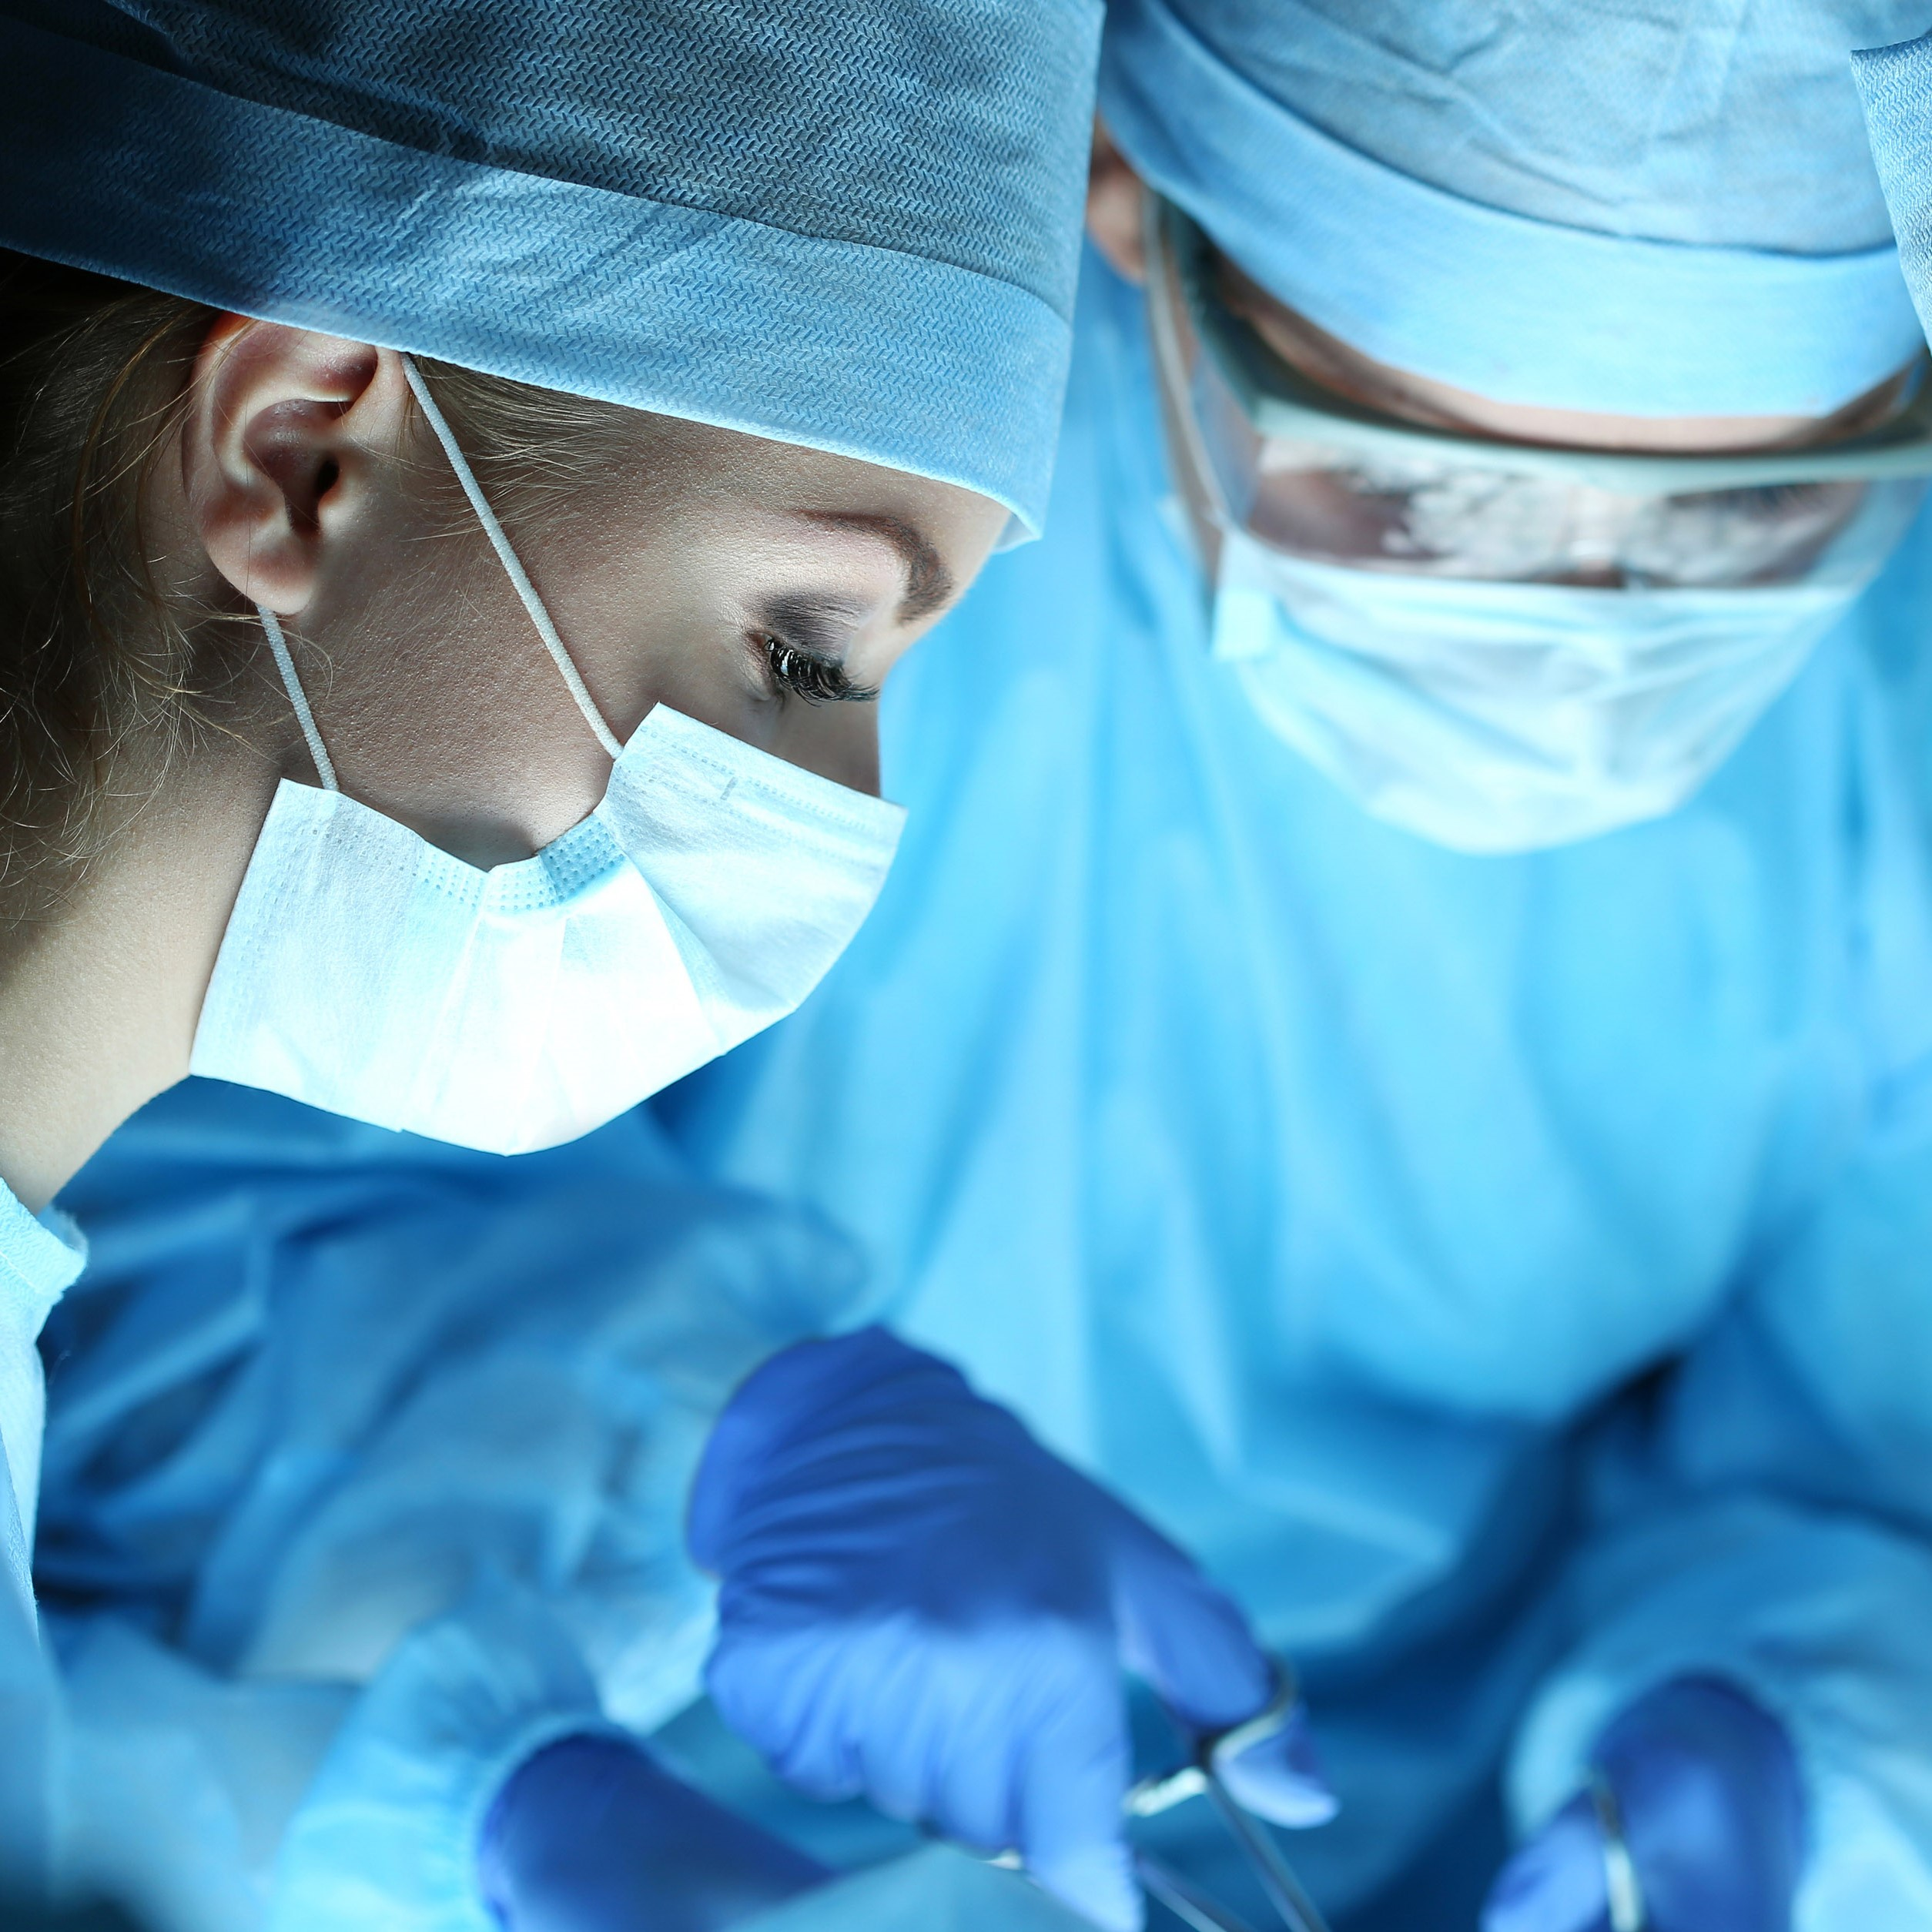 online anatomy course